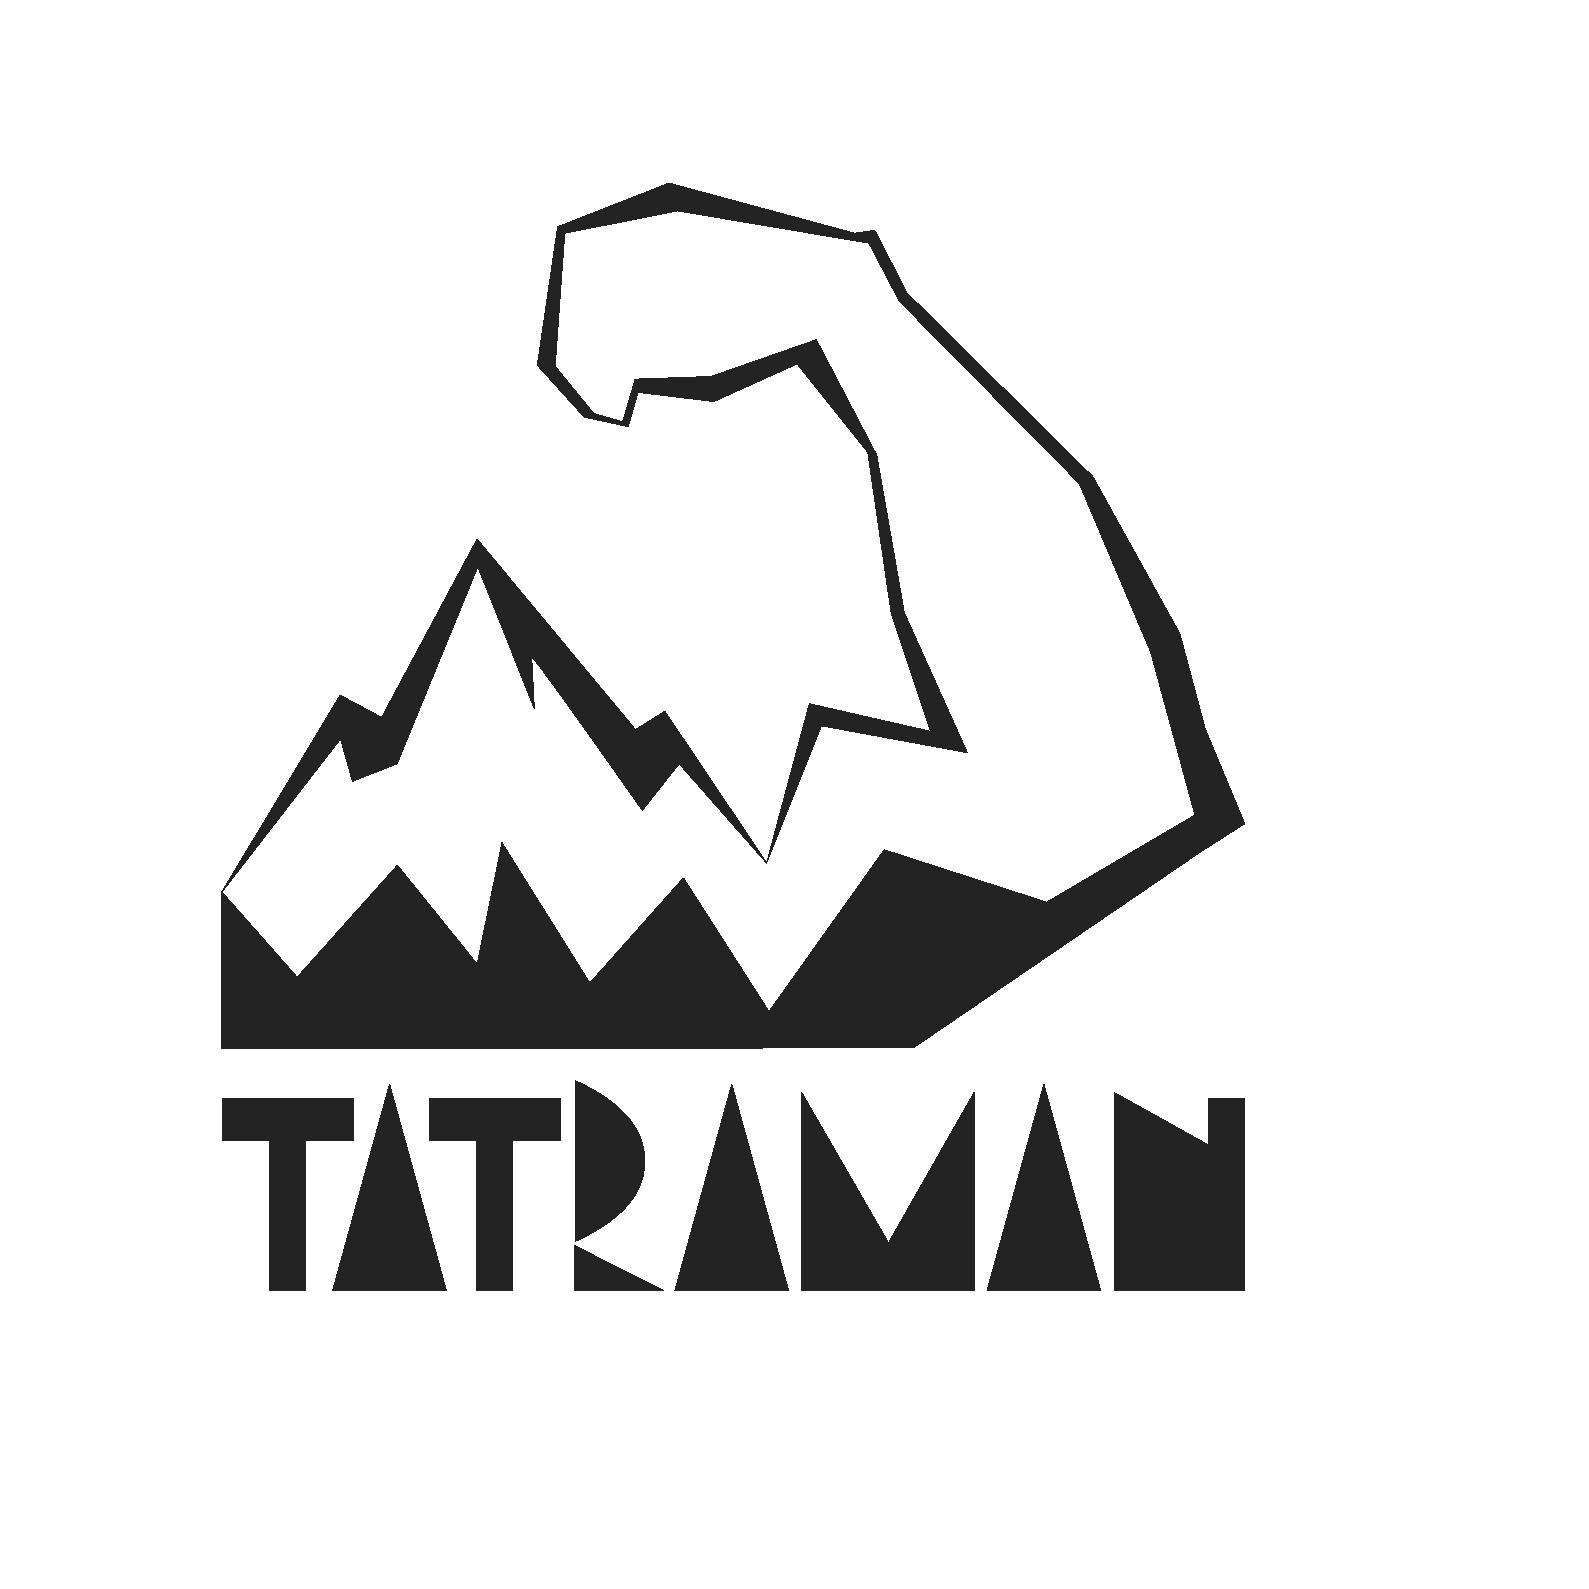 Logo Zawodów Tatraman Triathlon 2021